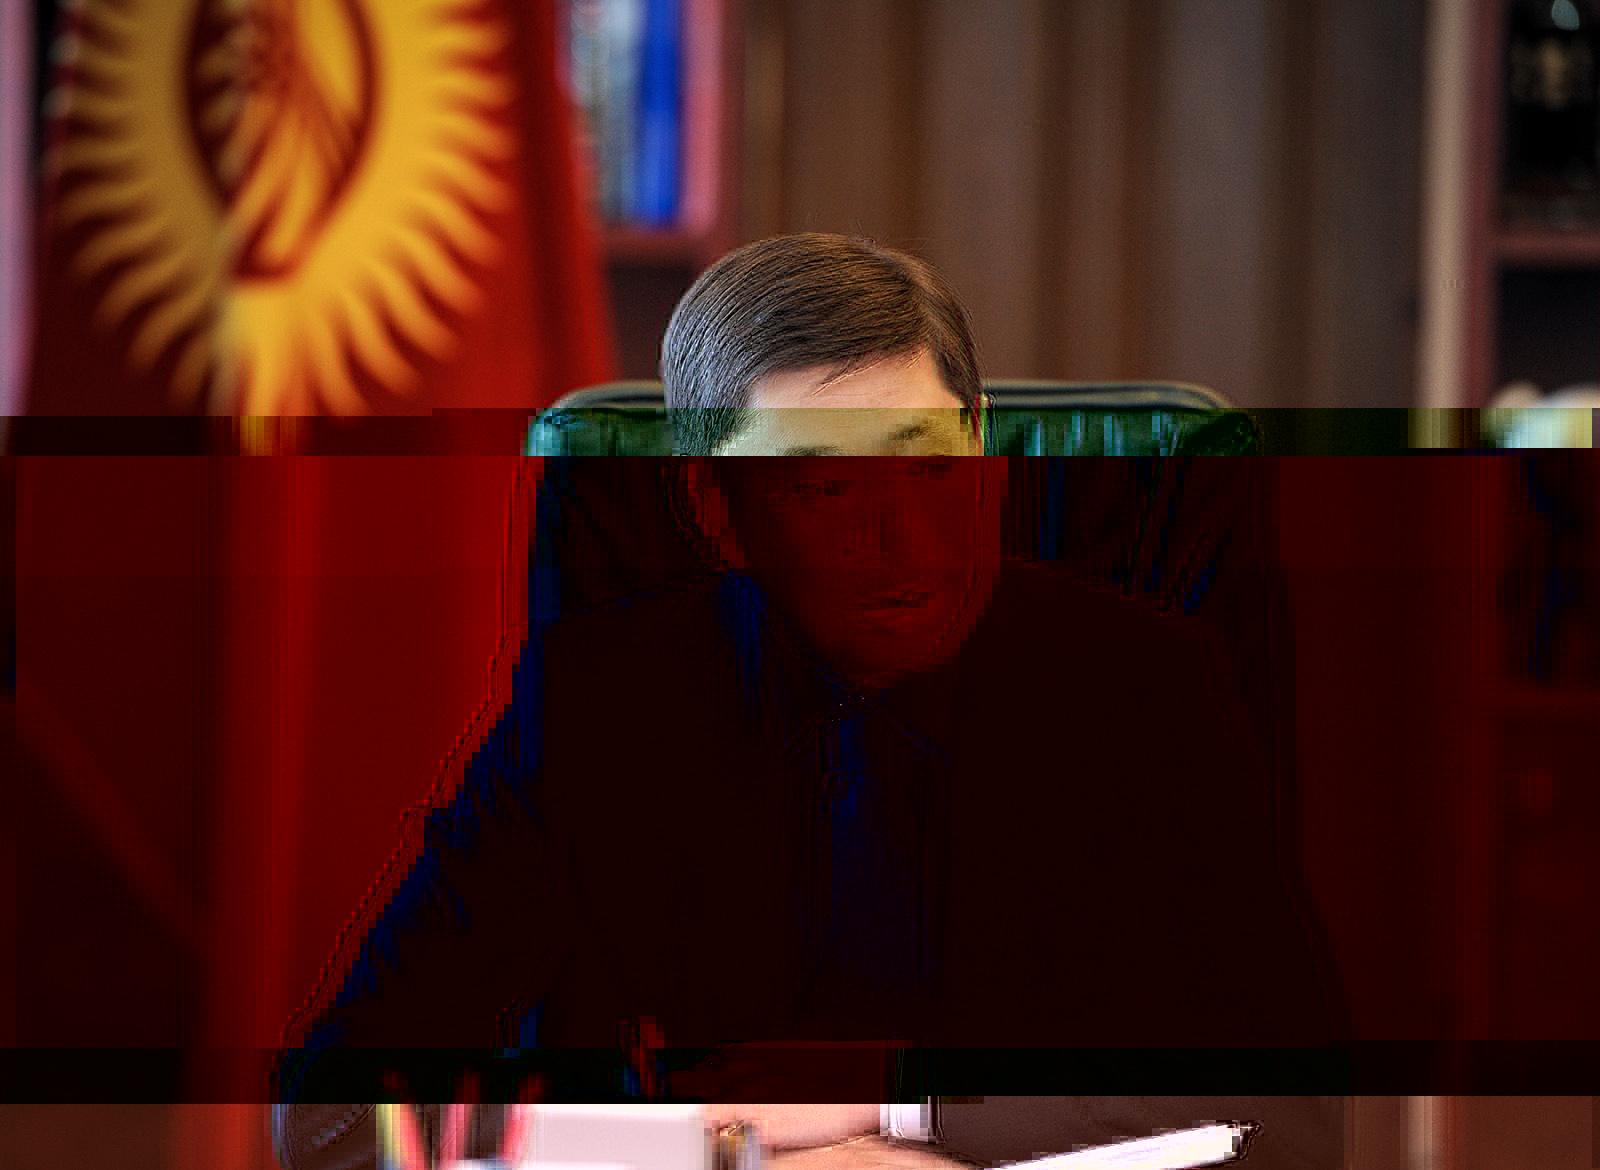 СДПК обратилась в комиссию по СМИ в защиту Сапара Исакова